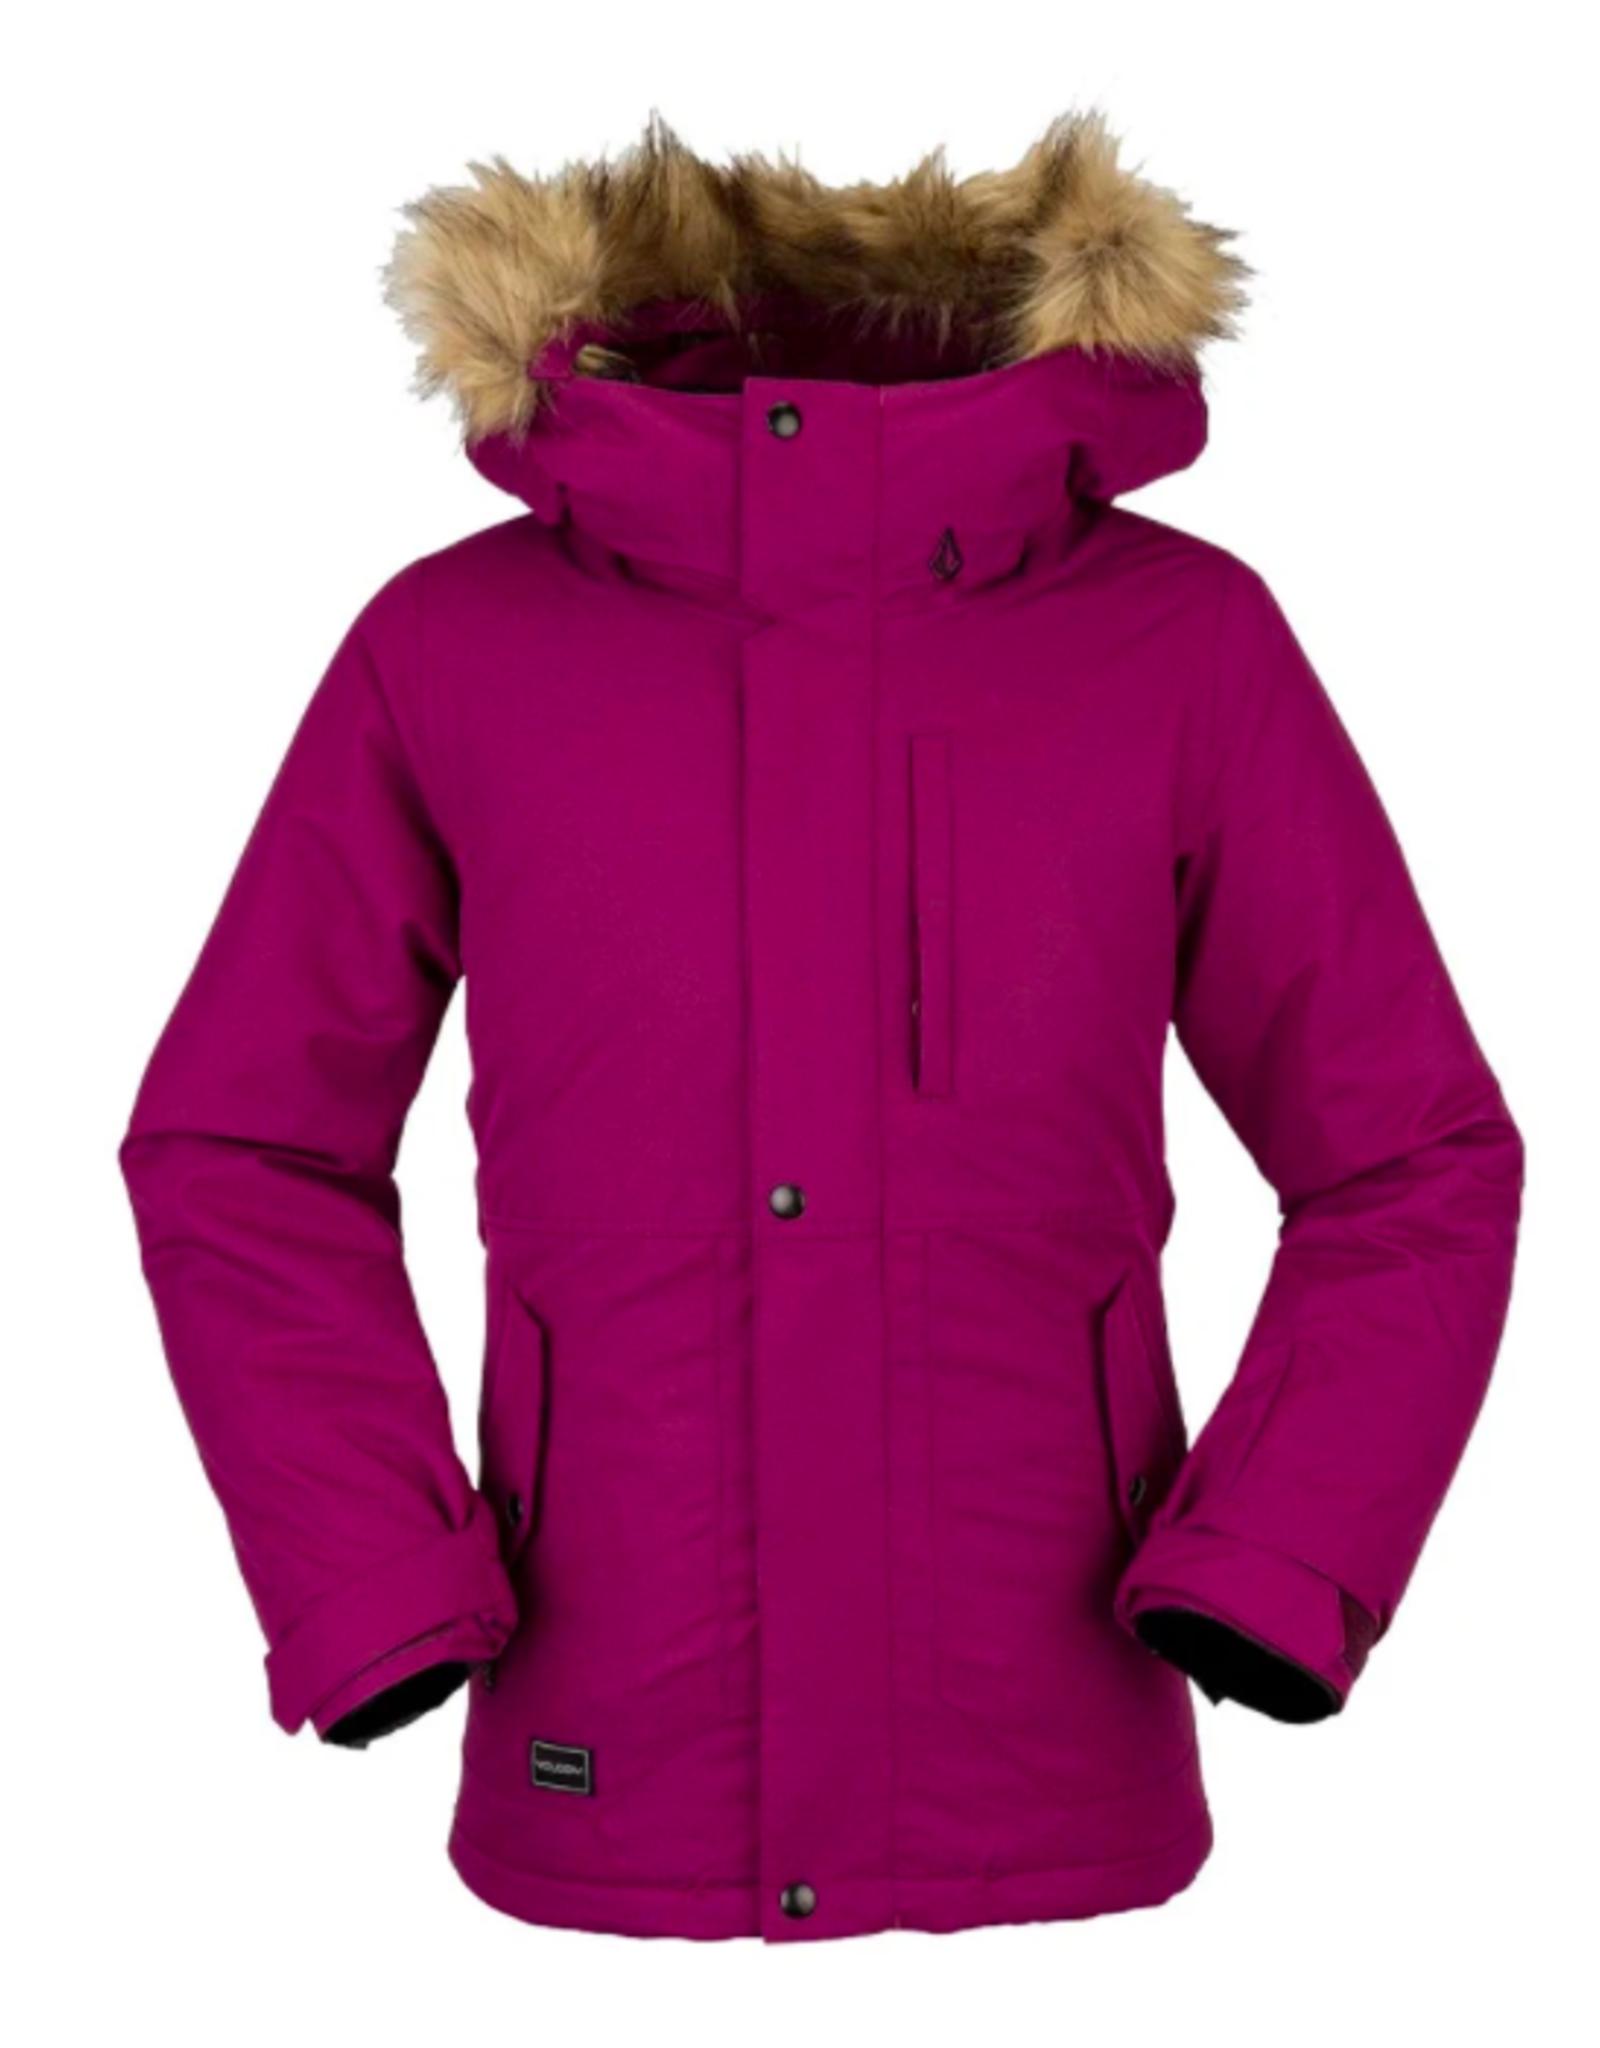 Volcom Girl's So Minty Insulated Jacket VIB 2022